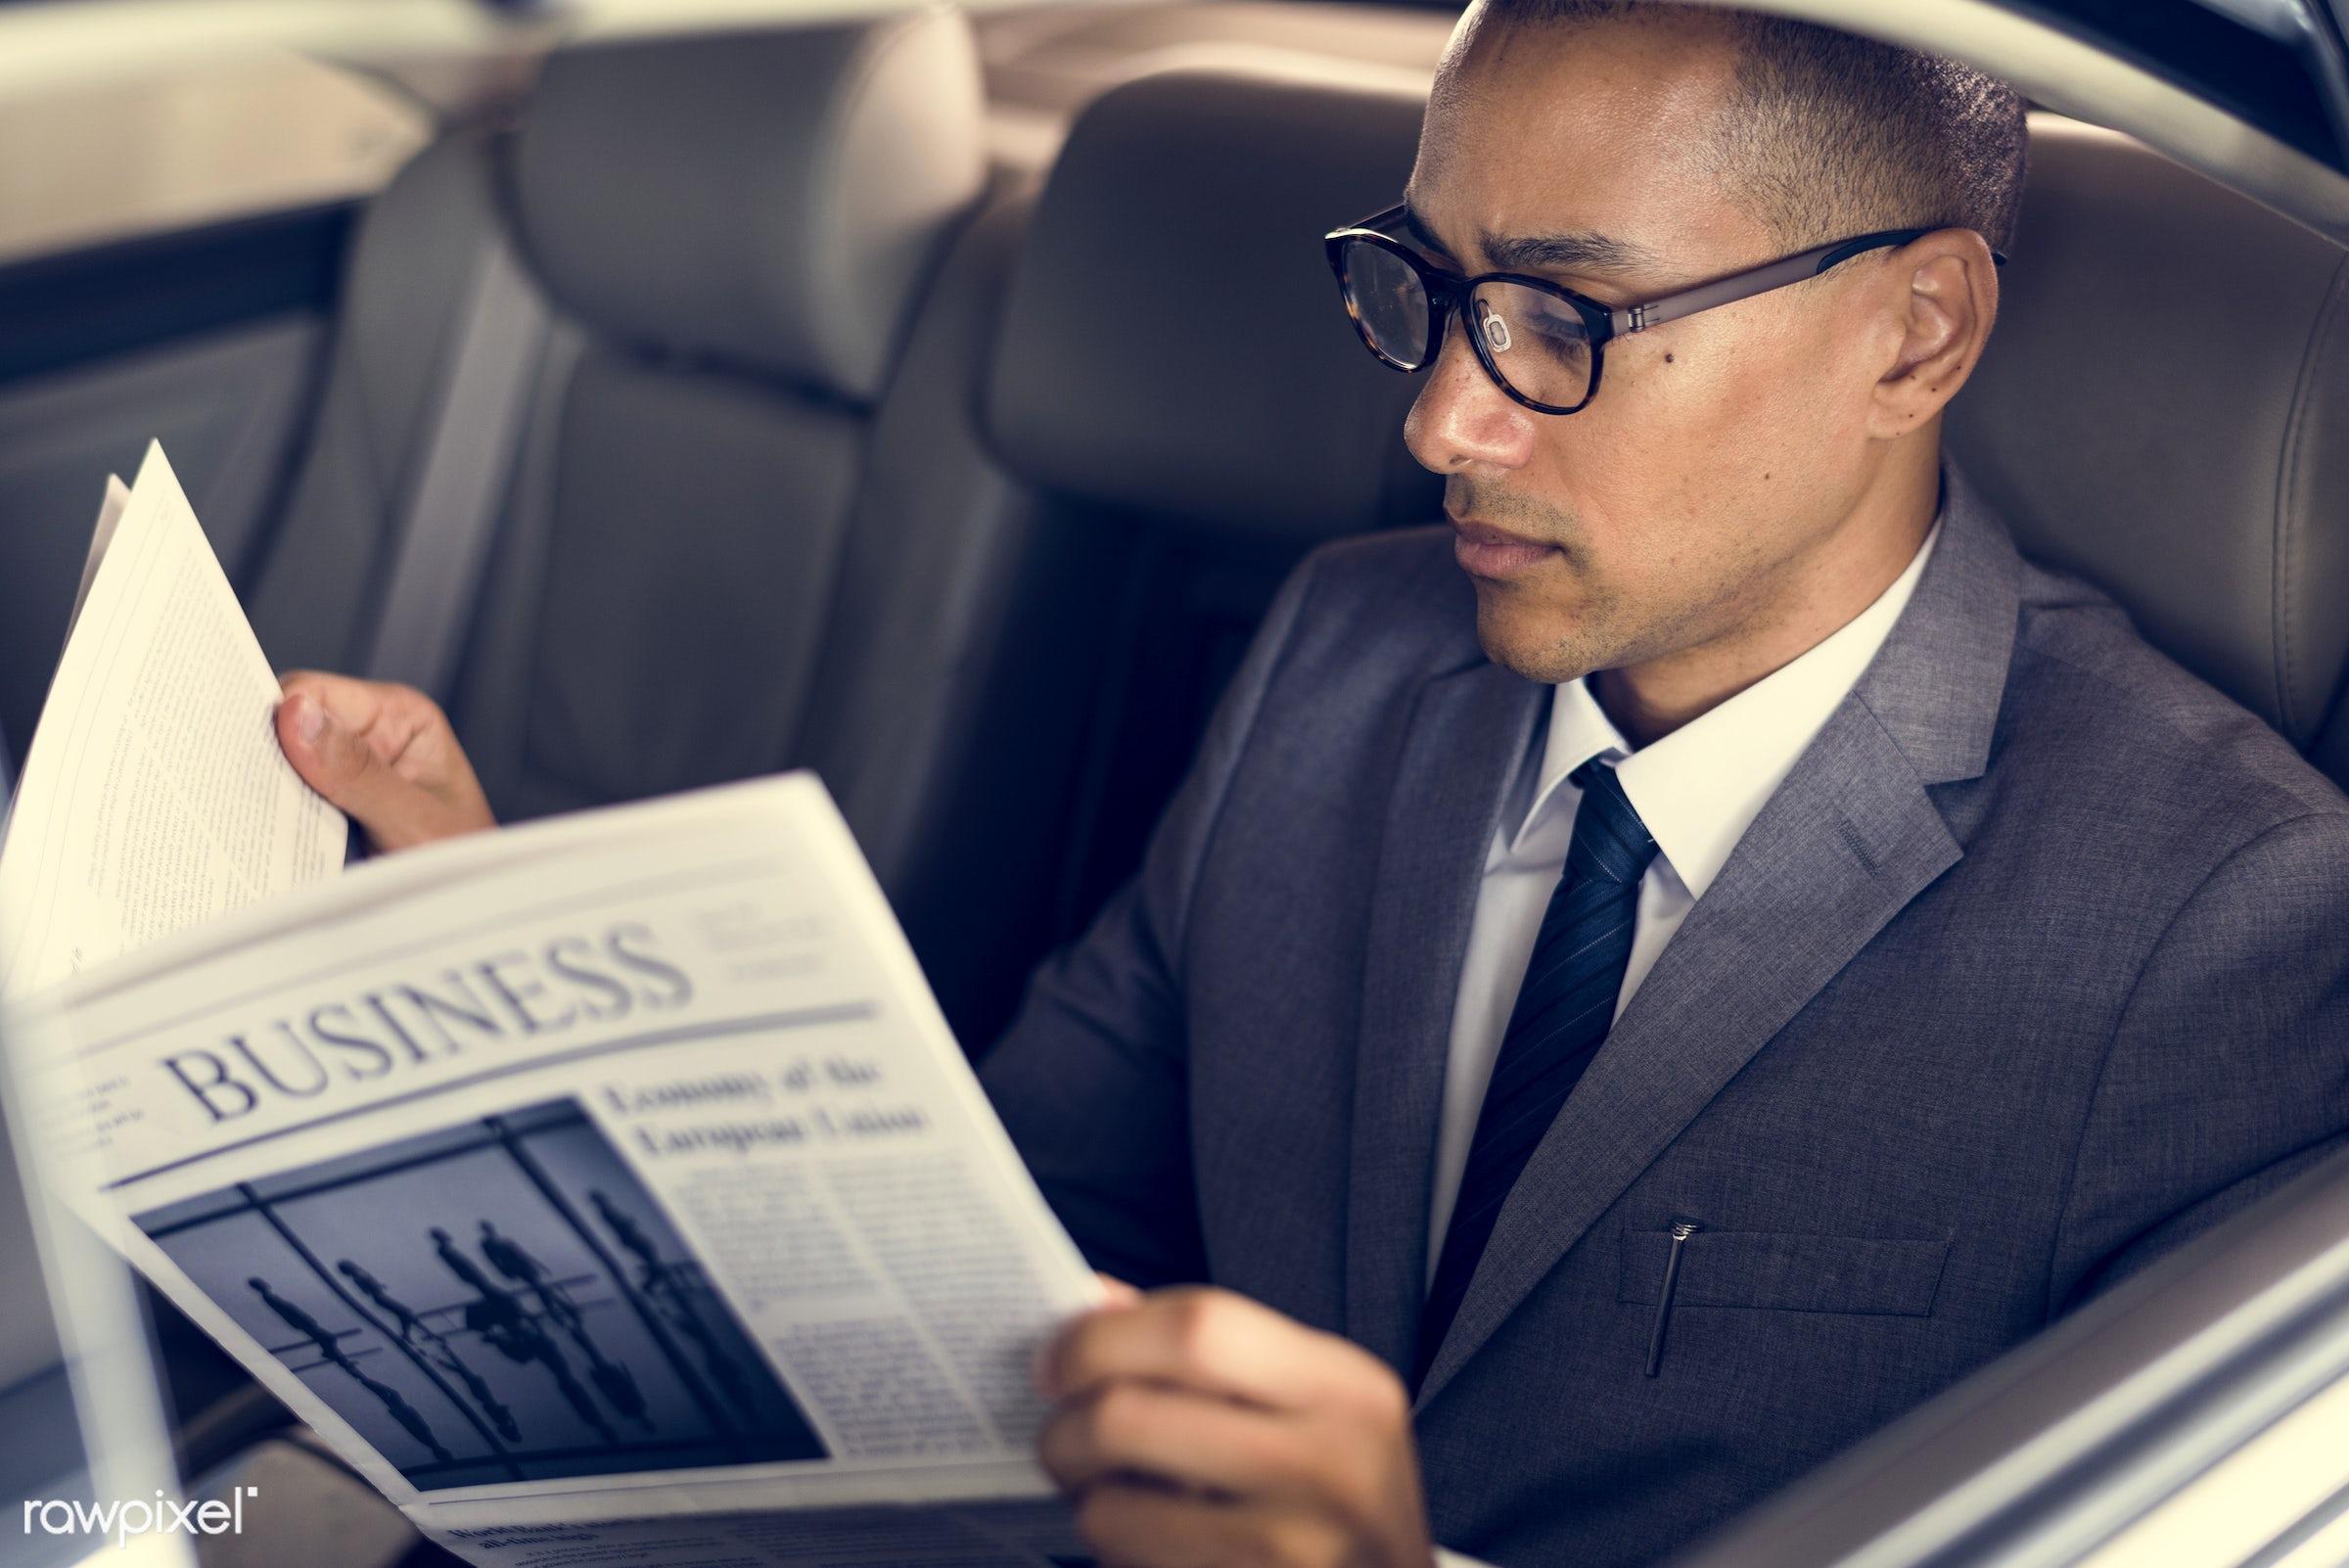 adult, back seat, break, breaking news, business, businessman, businessmen, candid, car, colleague, communication, corporate...